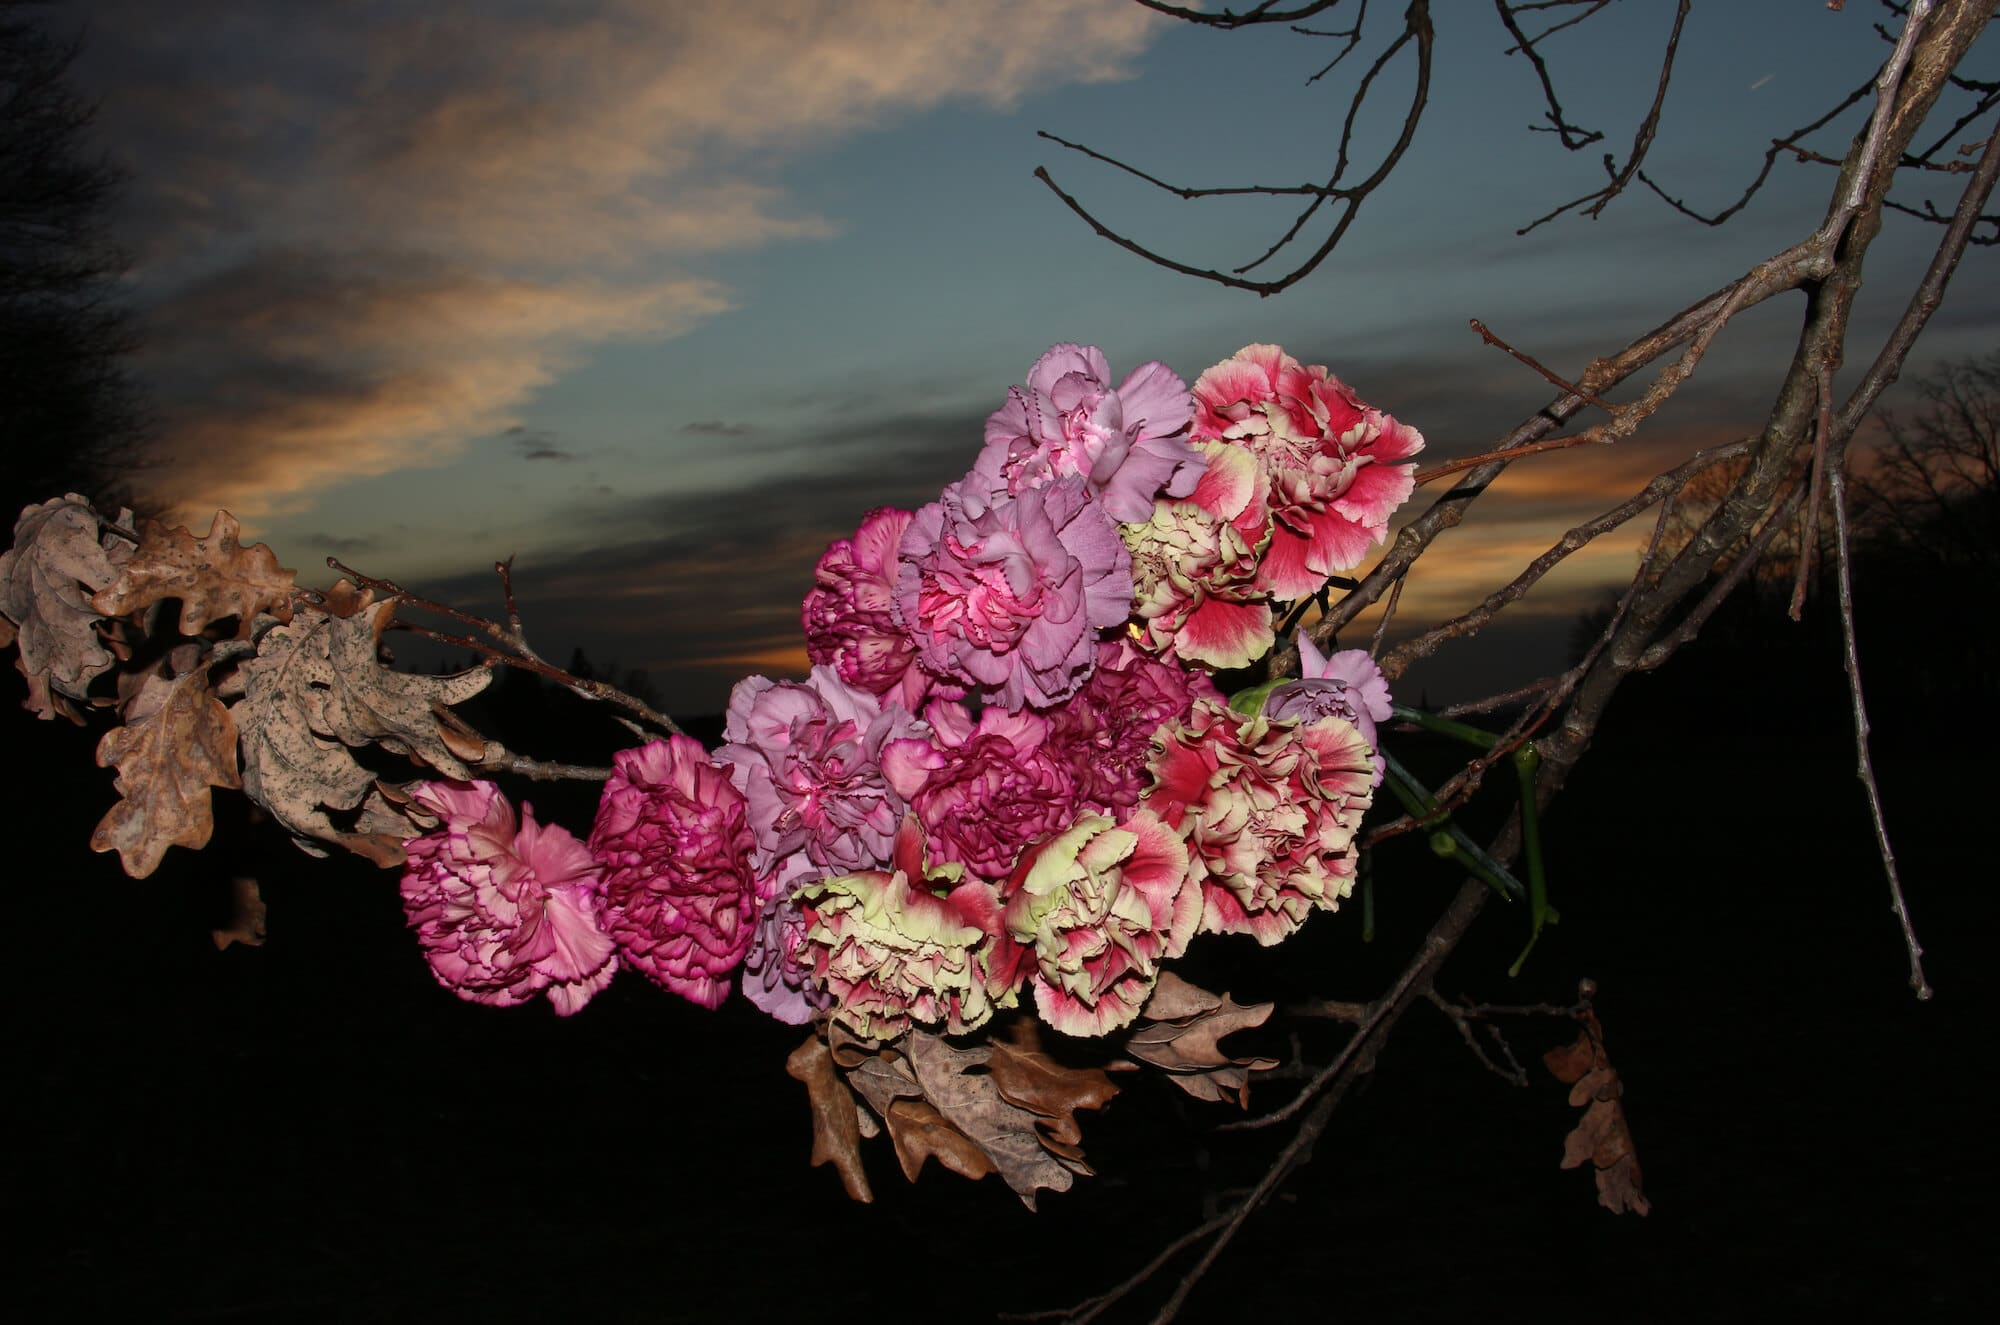 Meike Männel Blumen I, 2018 Fotografie, 68 x 100 cm